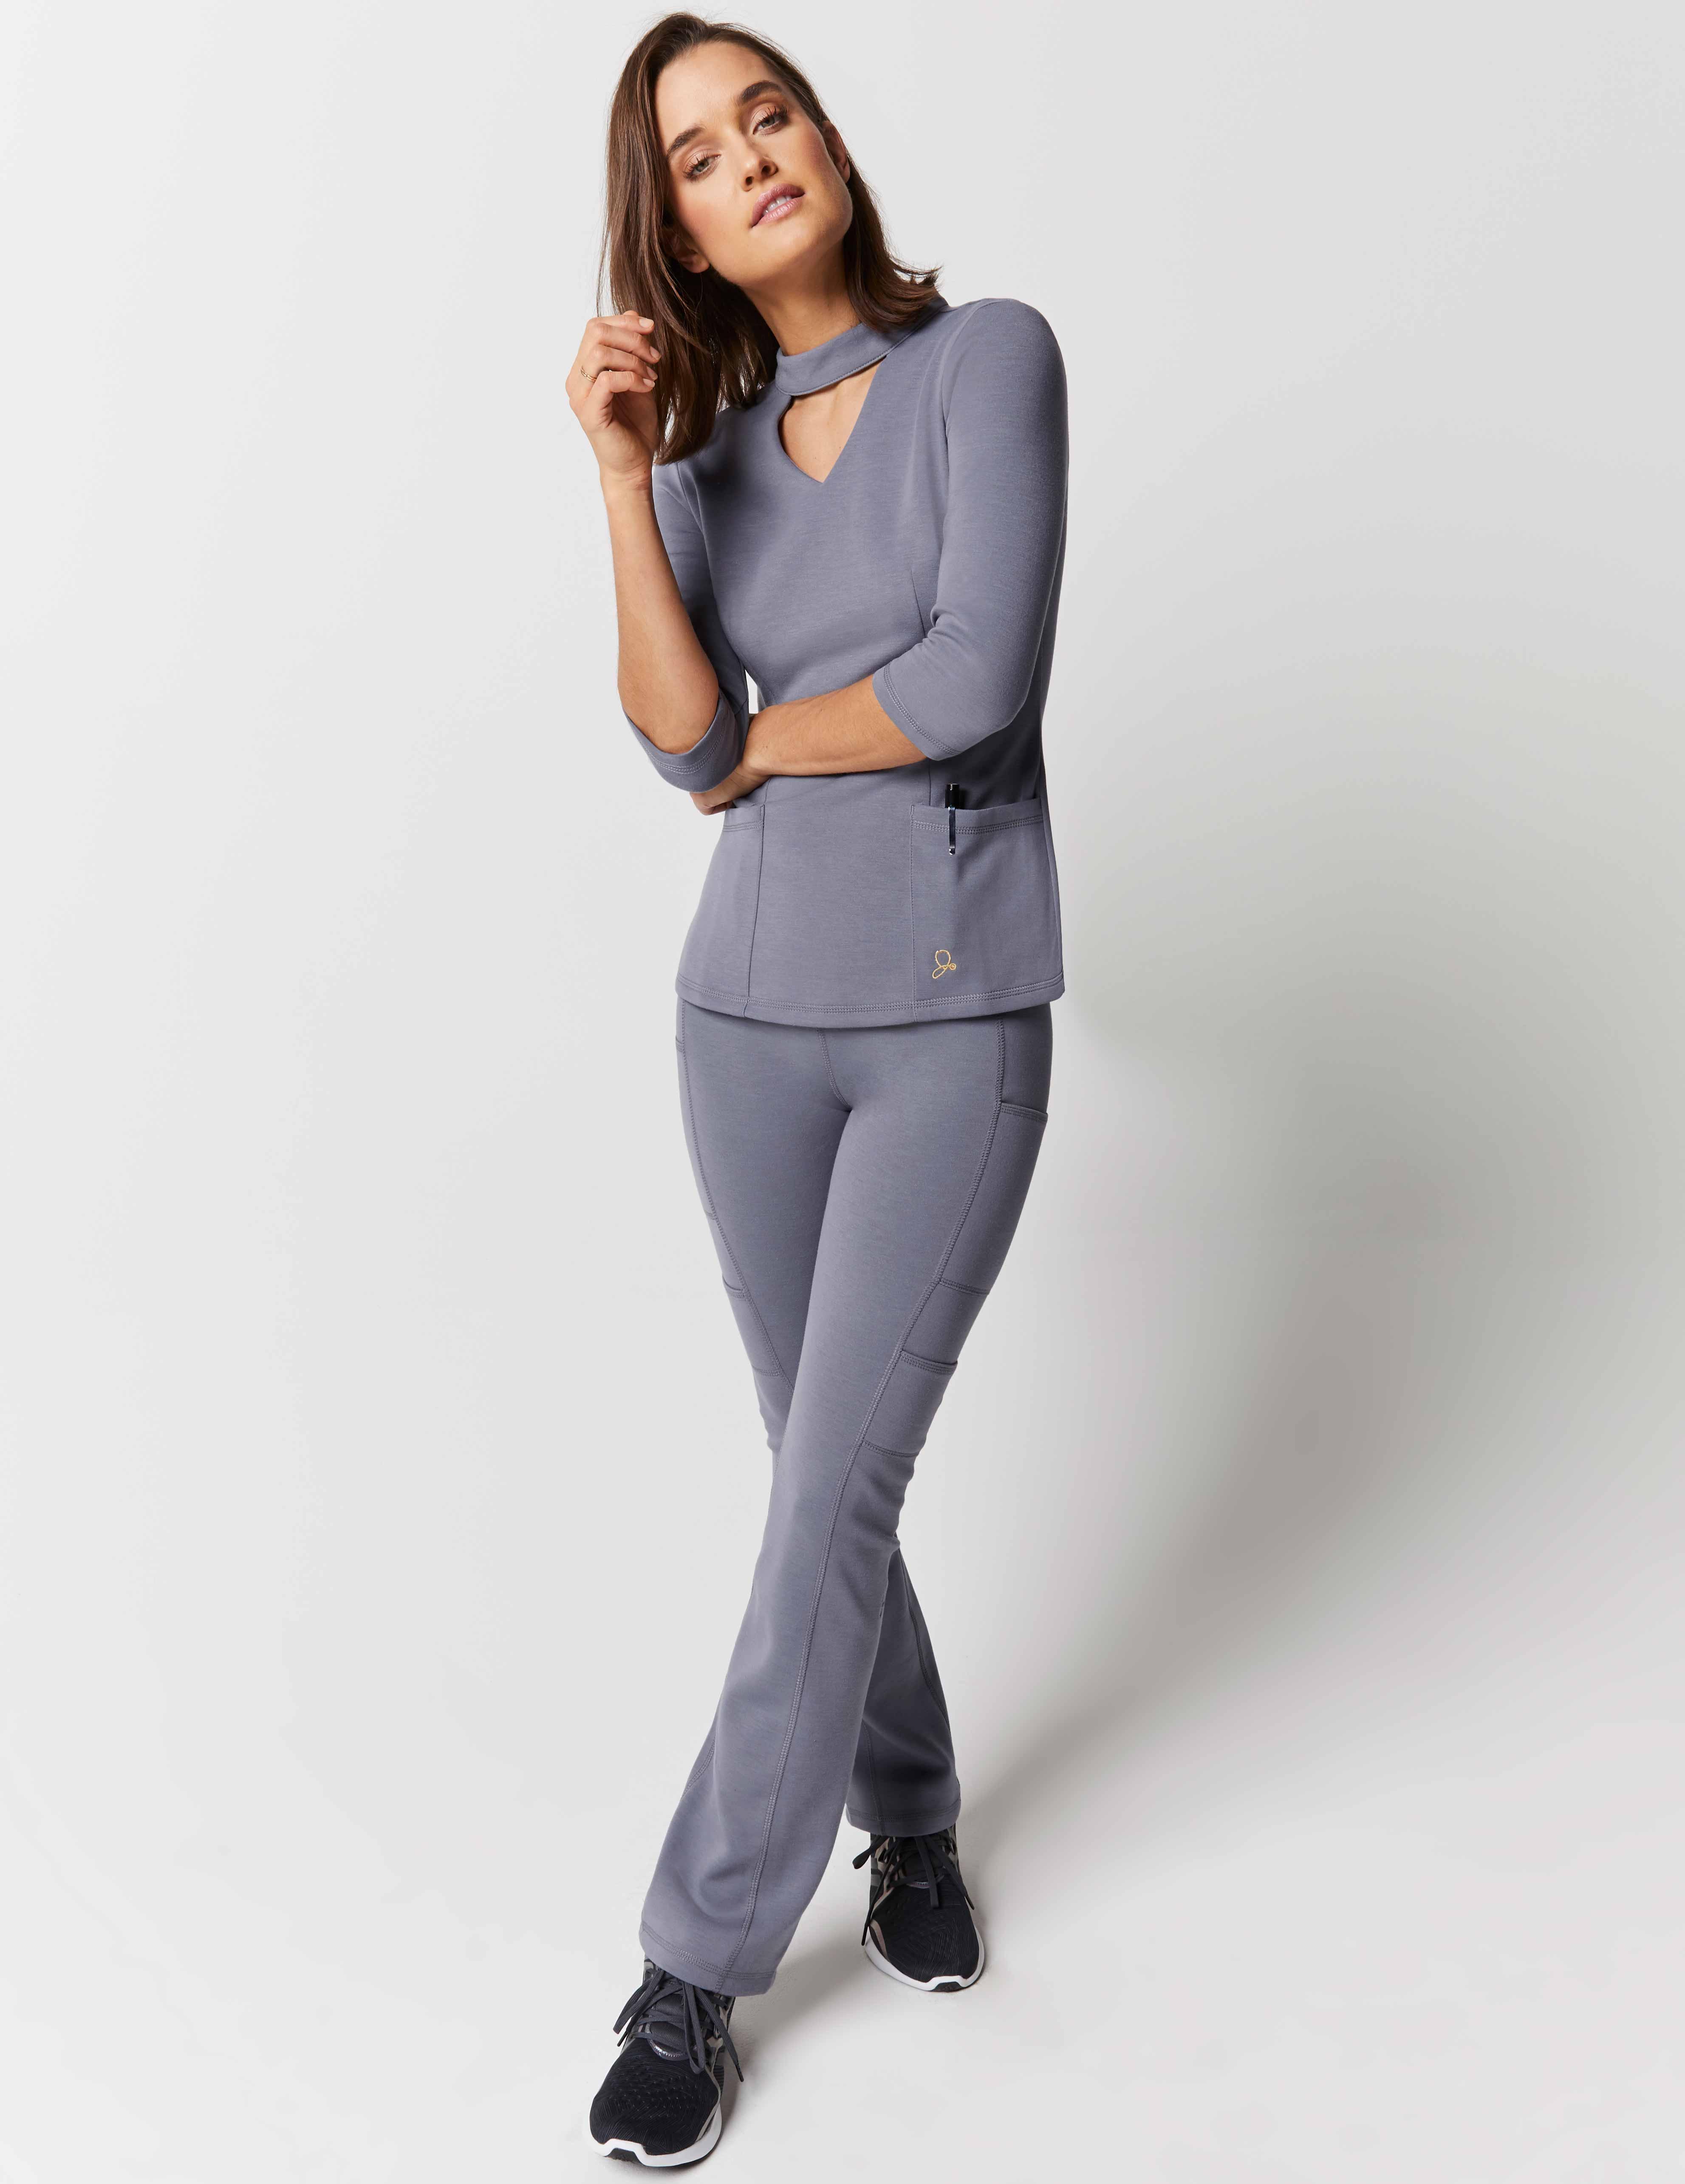 ed780aeb4f Mock Neck Top + Yoga Pant - Medical Scrubs by Jaanuu